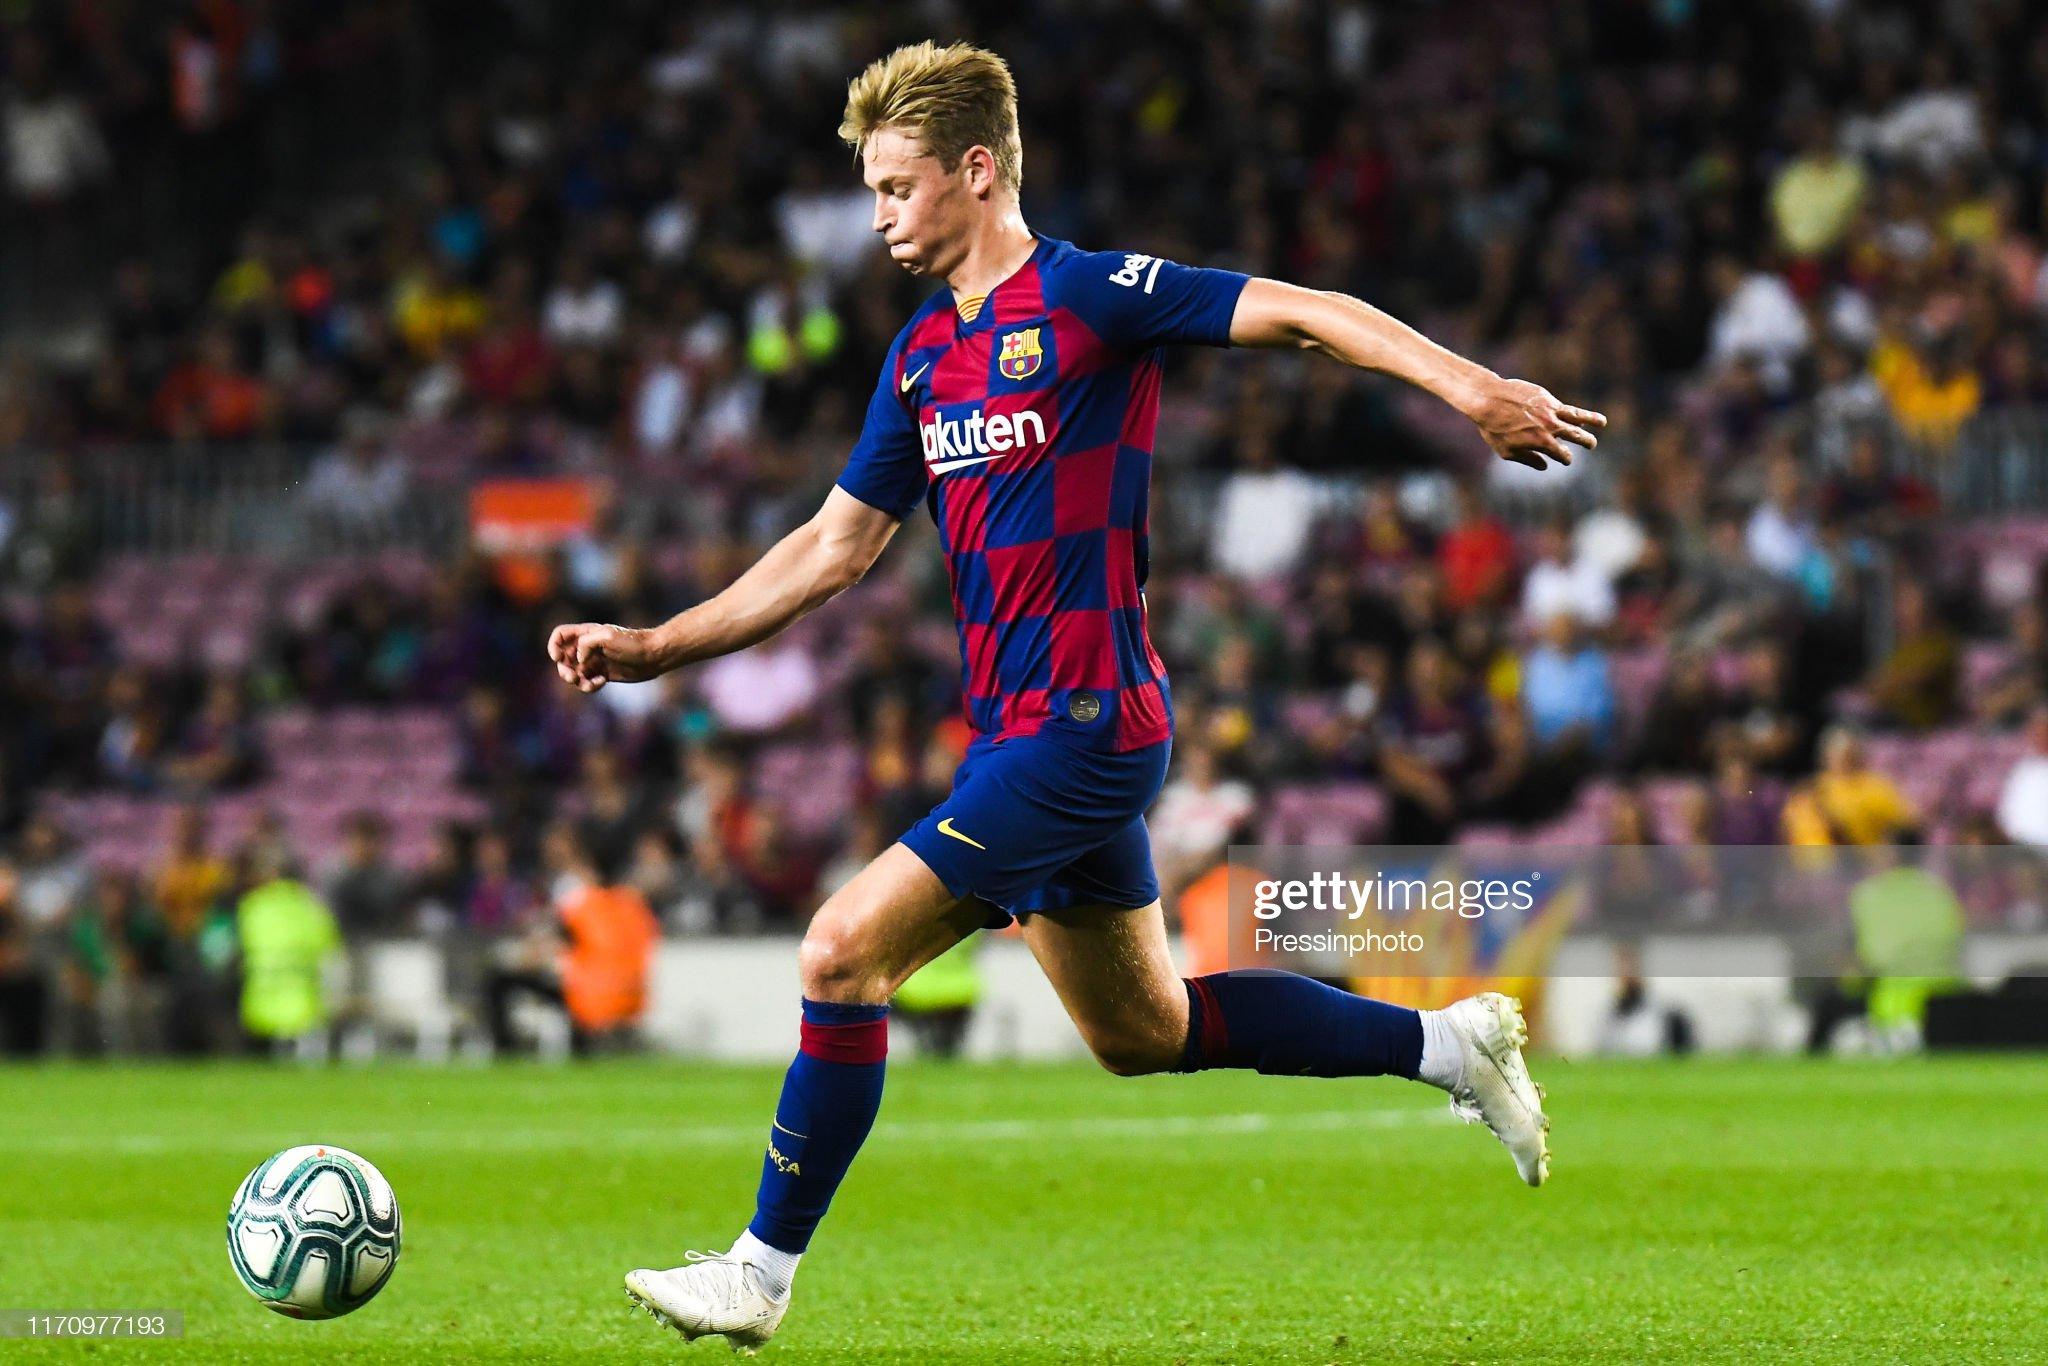 صور مباراة : برشلونة - فياريال 2-1 ( 24-09-2019 )  Frenkie-de-jong-of-fc-barcelona-during-the-liga-match-between-and-picture-id1170977193?s=2048x2048